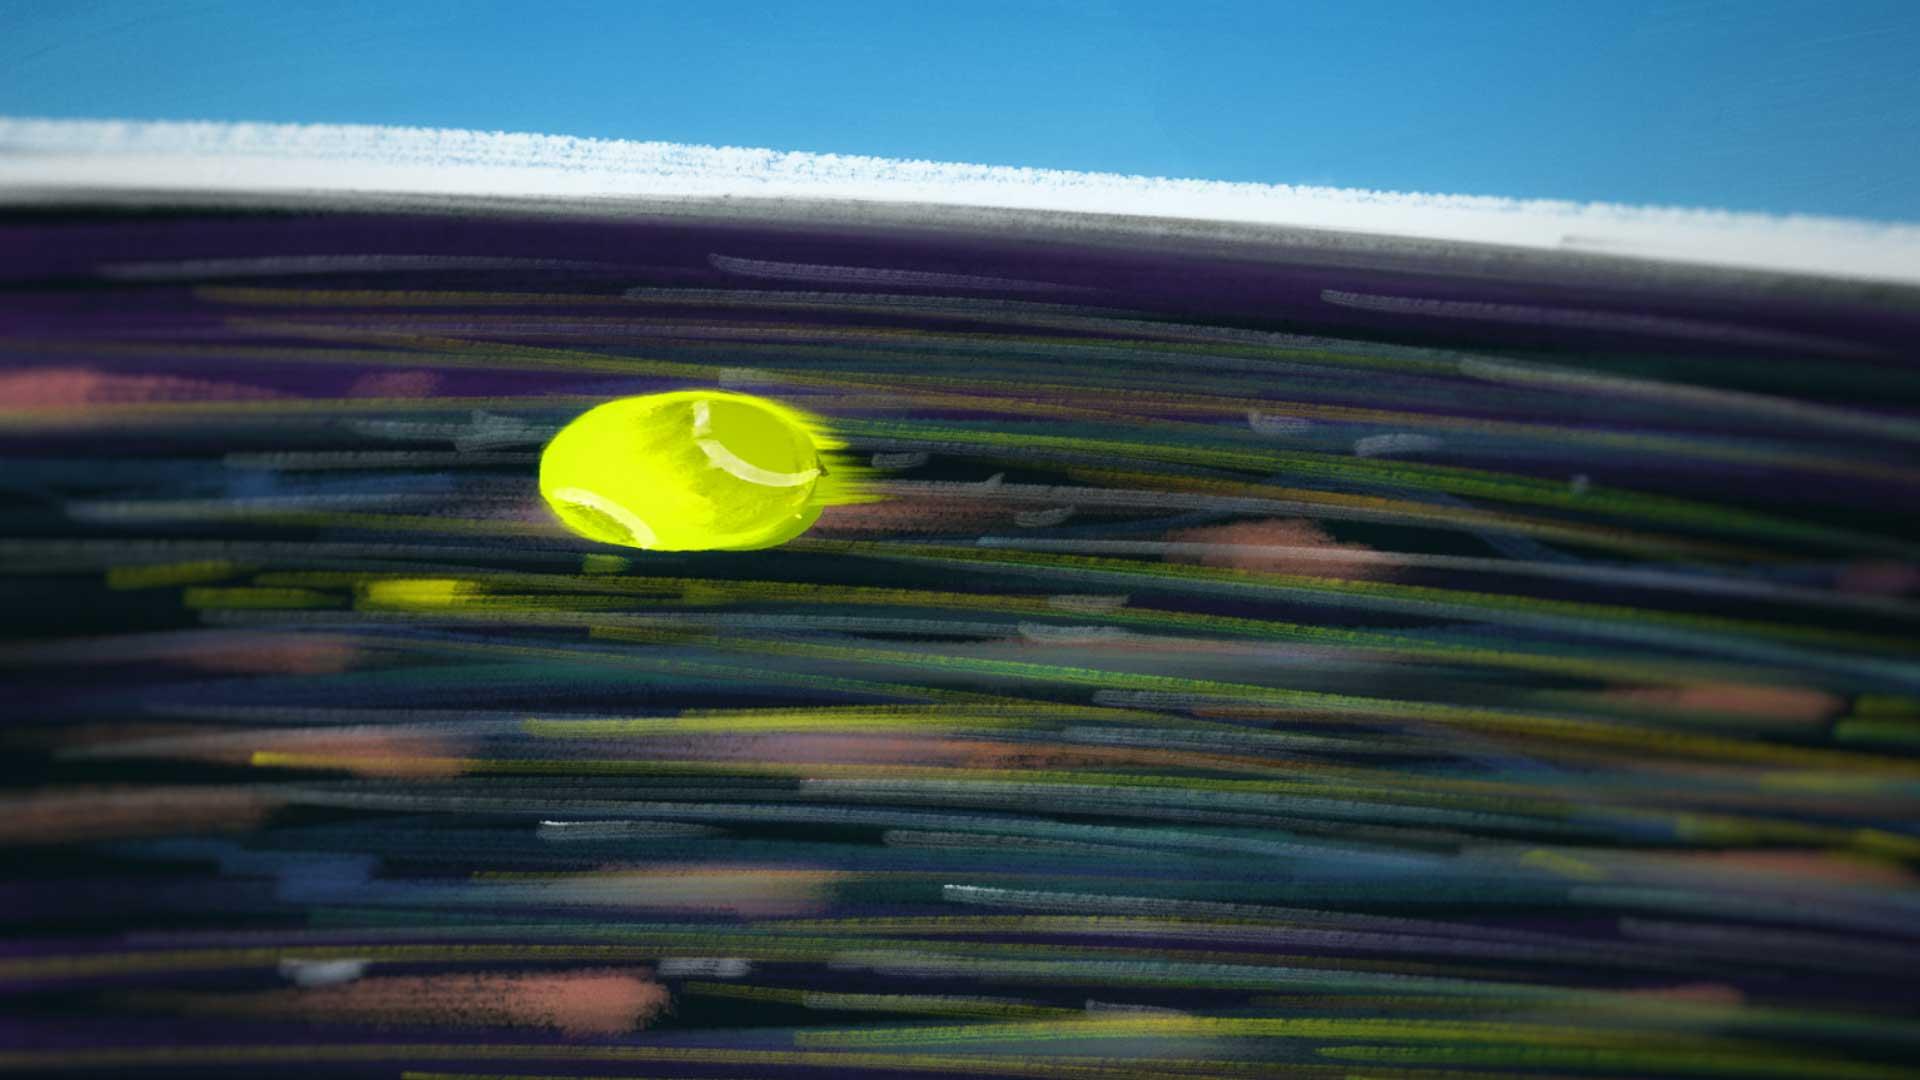 Wimbledon2019_EVAN_30s_25fps_v4c.jpg